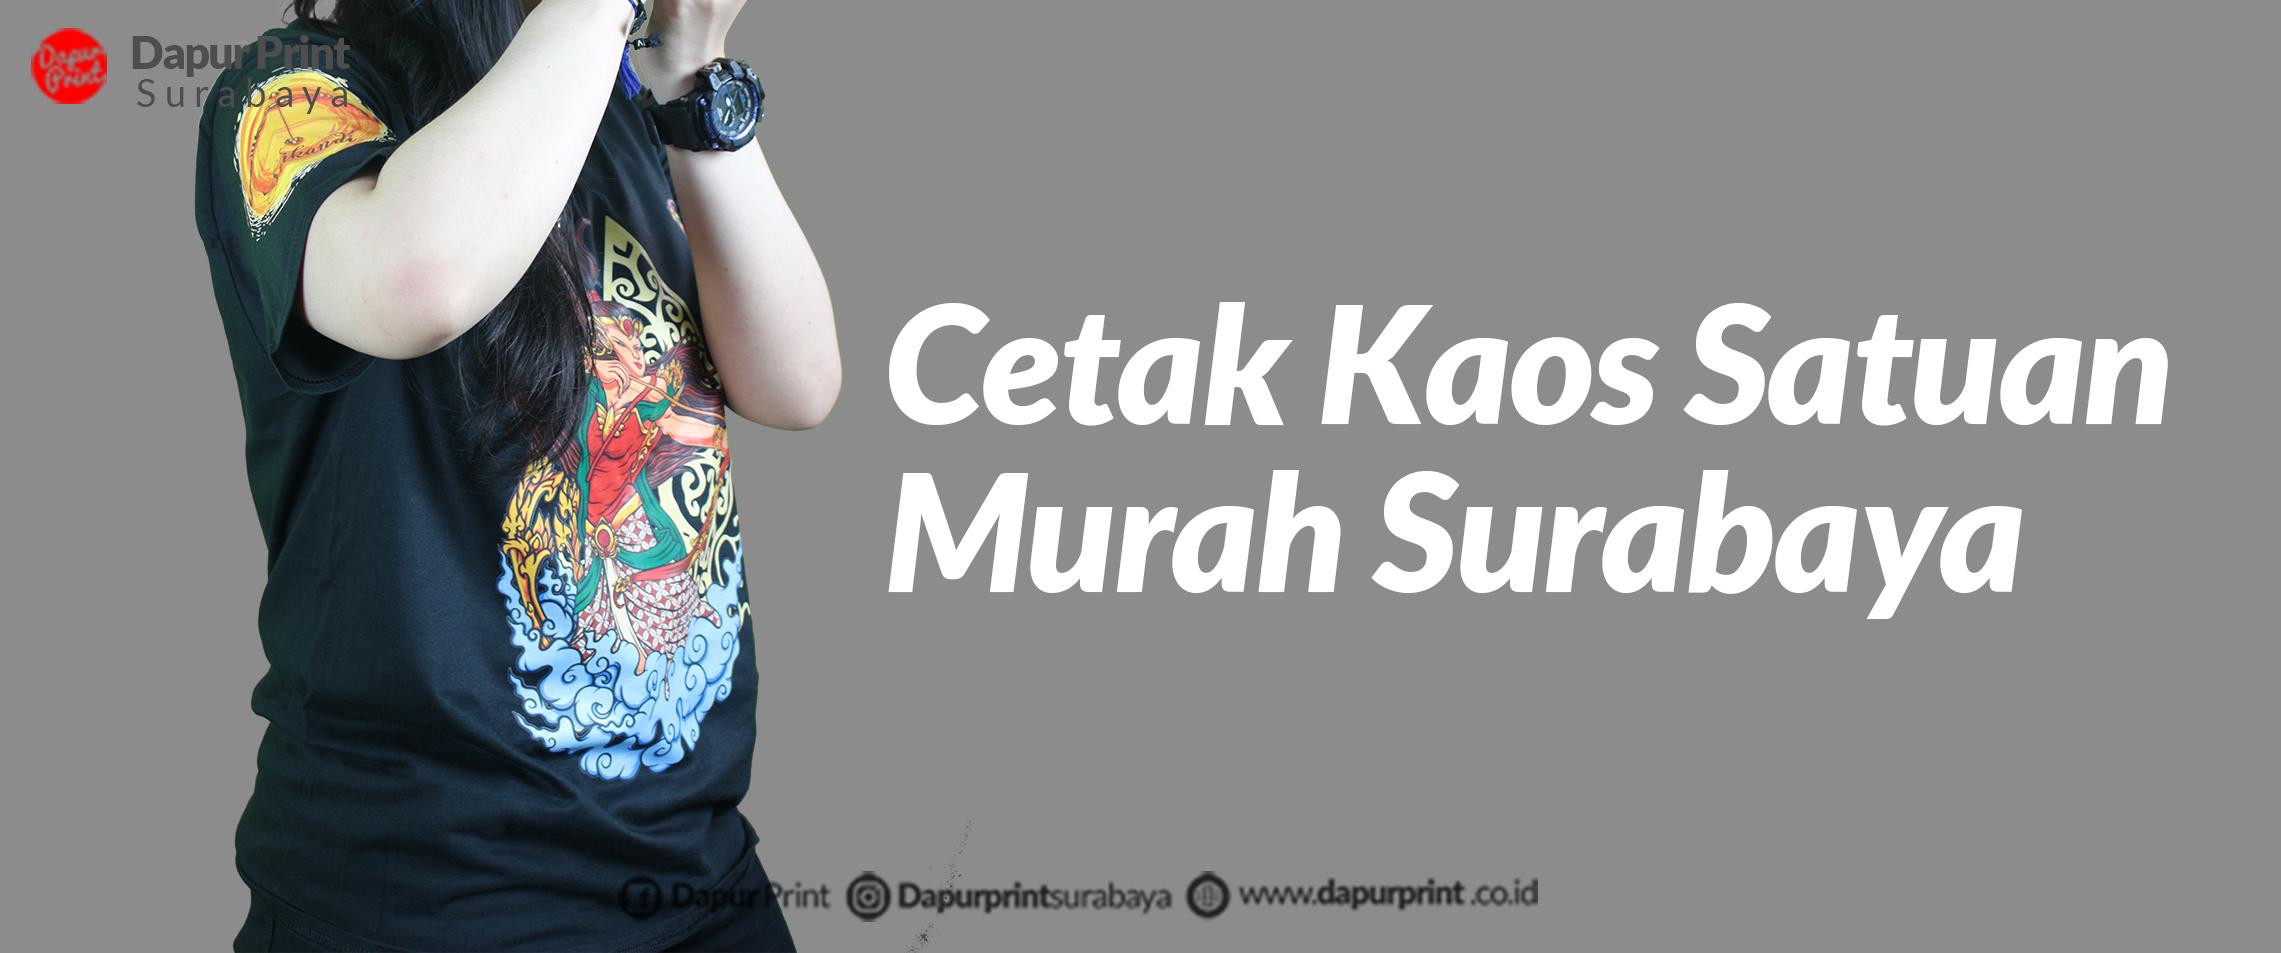 Cetak Kaos Satuan Murah Surabaya